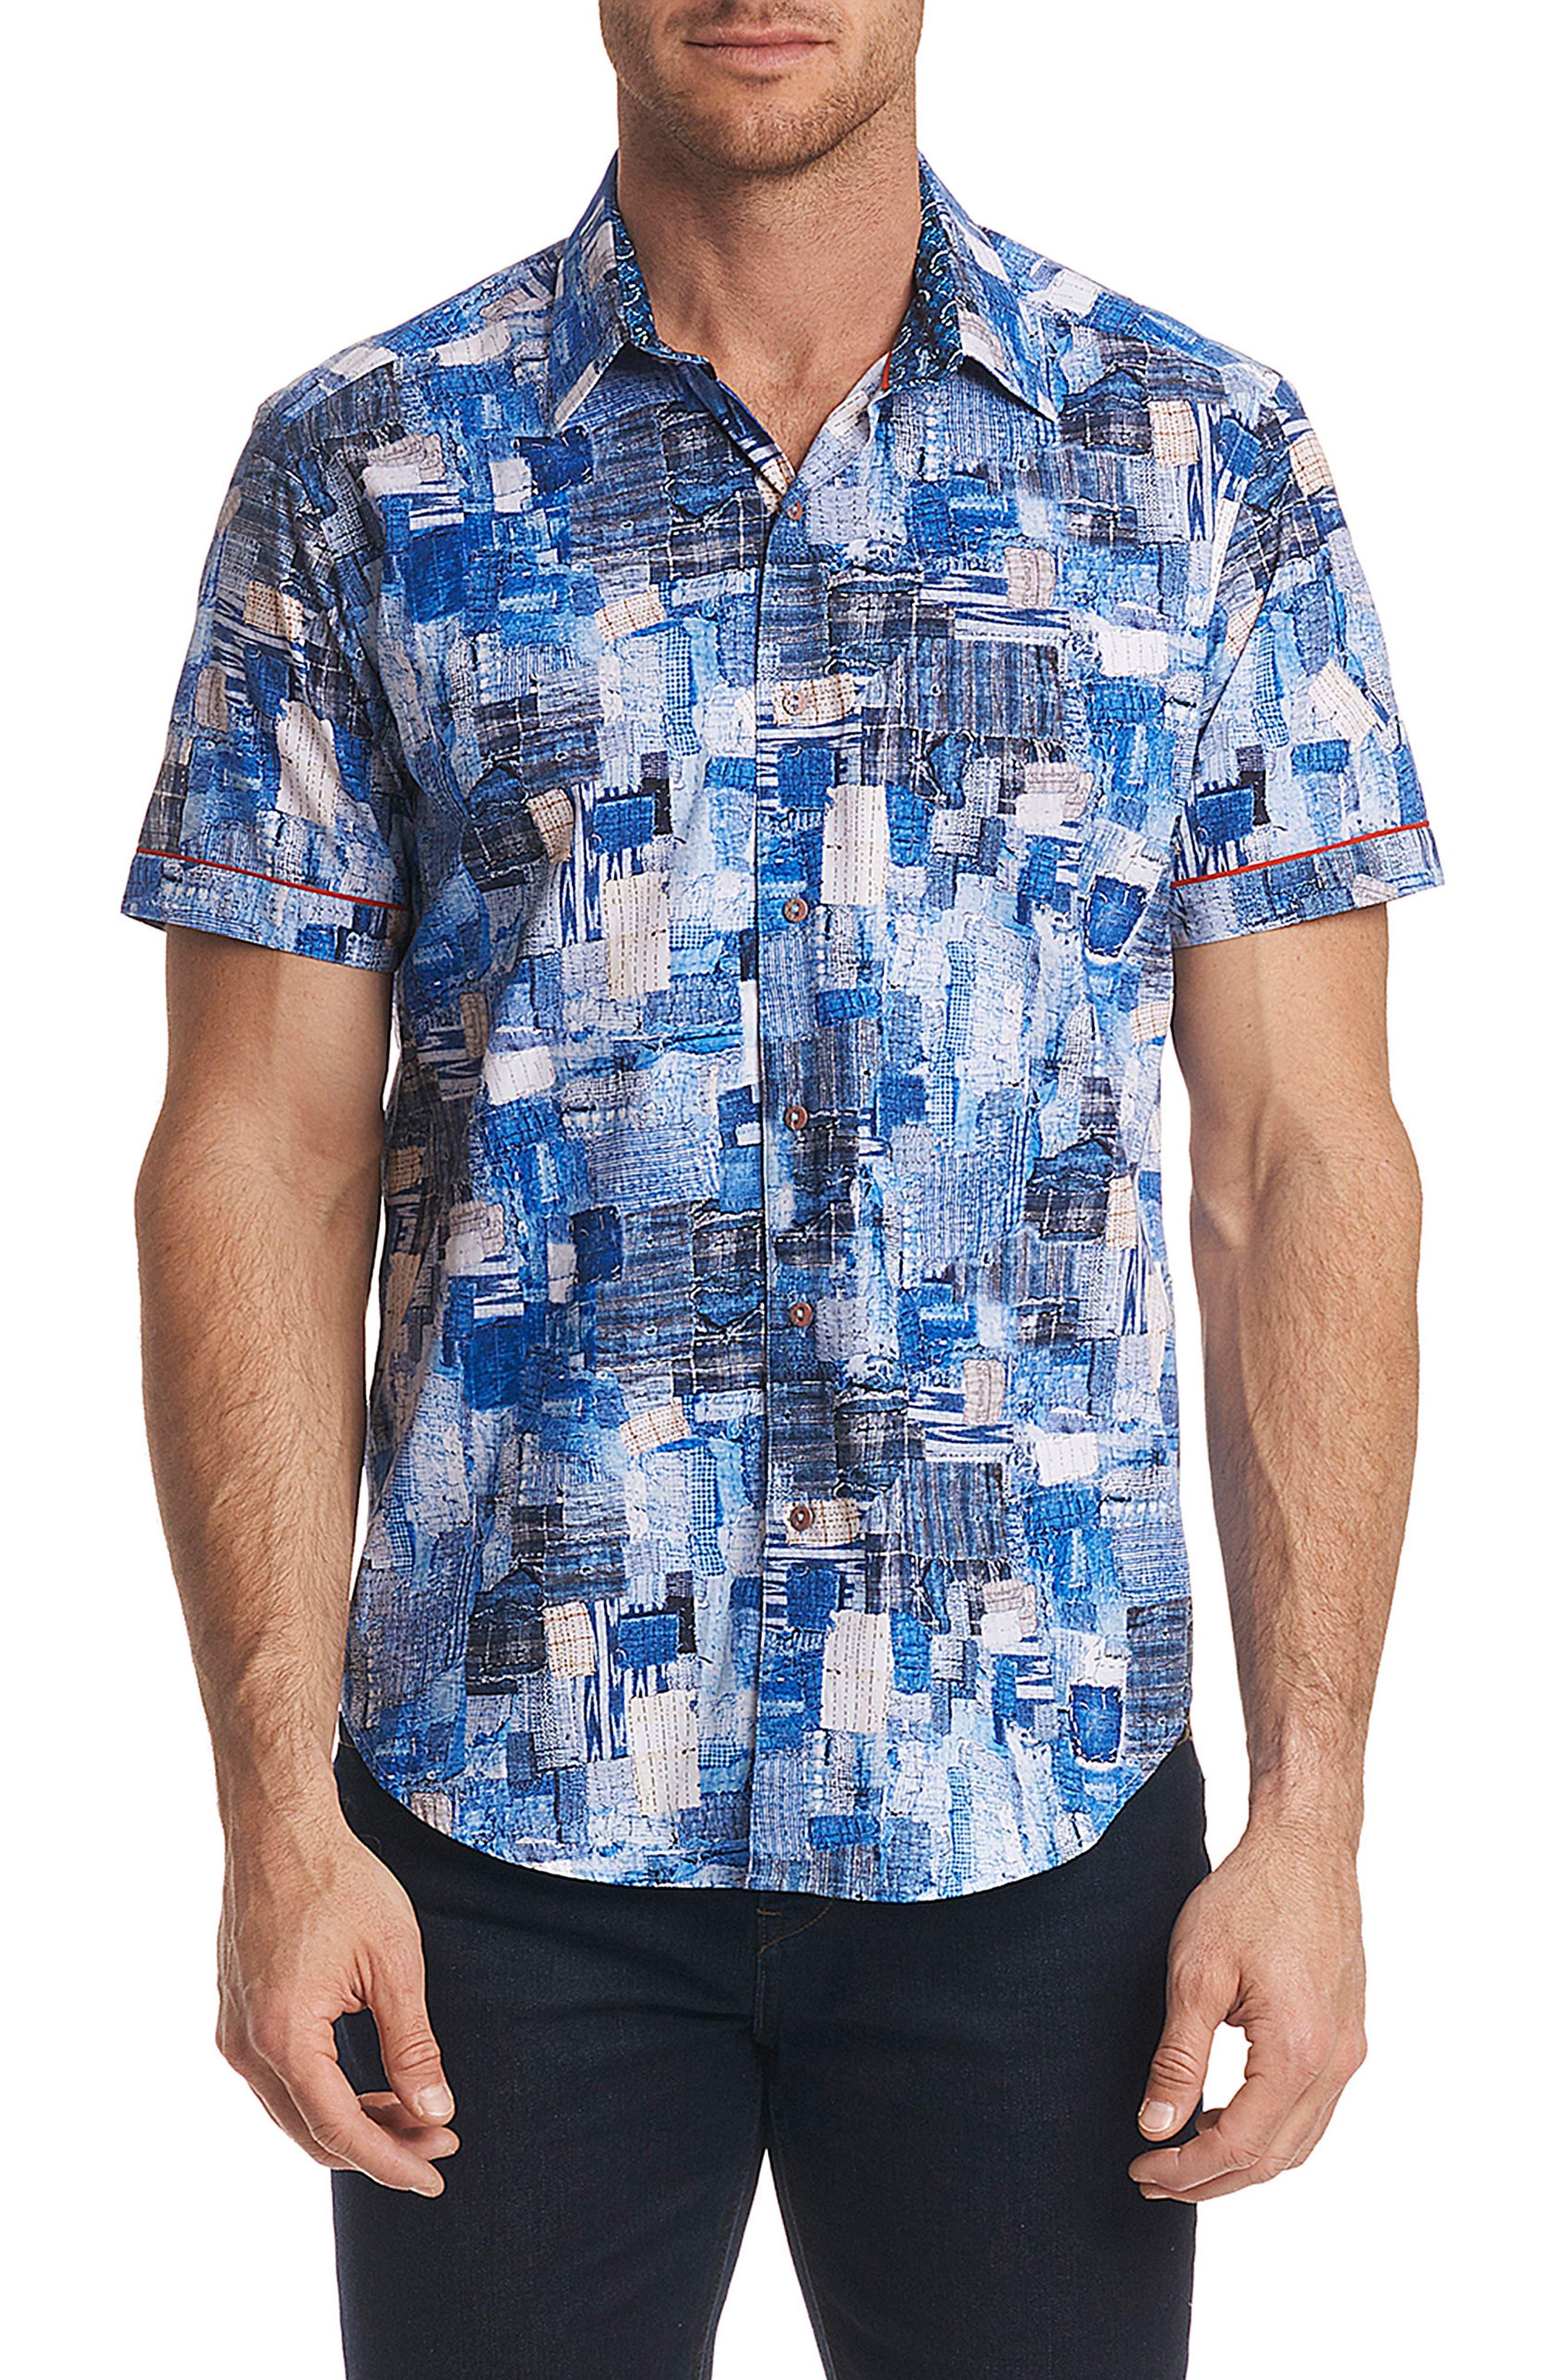 Canberra Classic Fit Sport Shirt,                             Main thumbnail 1, color,                             Blue